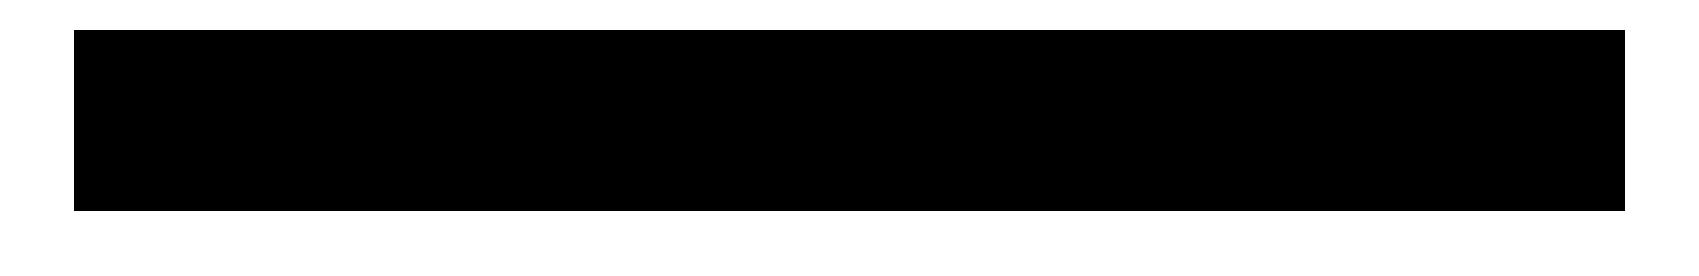 Usbek et Rica